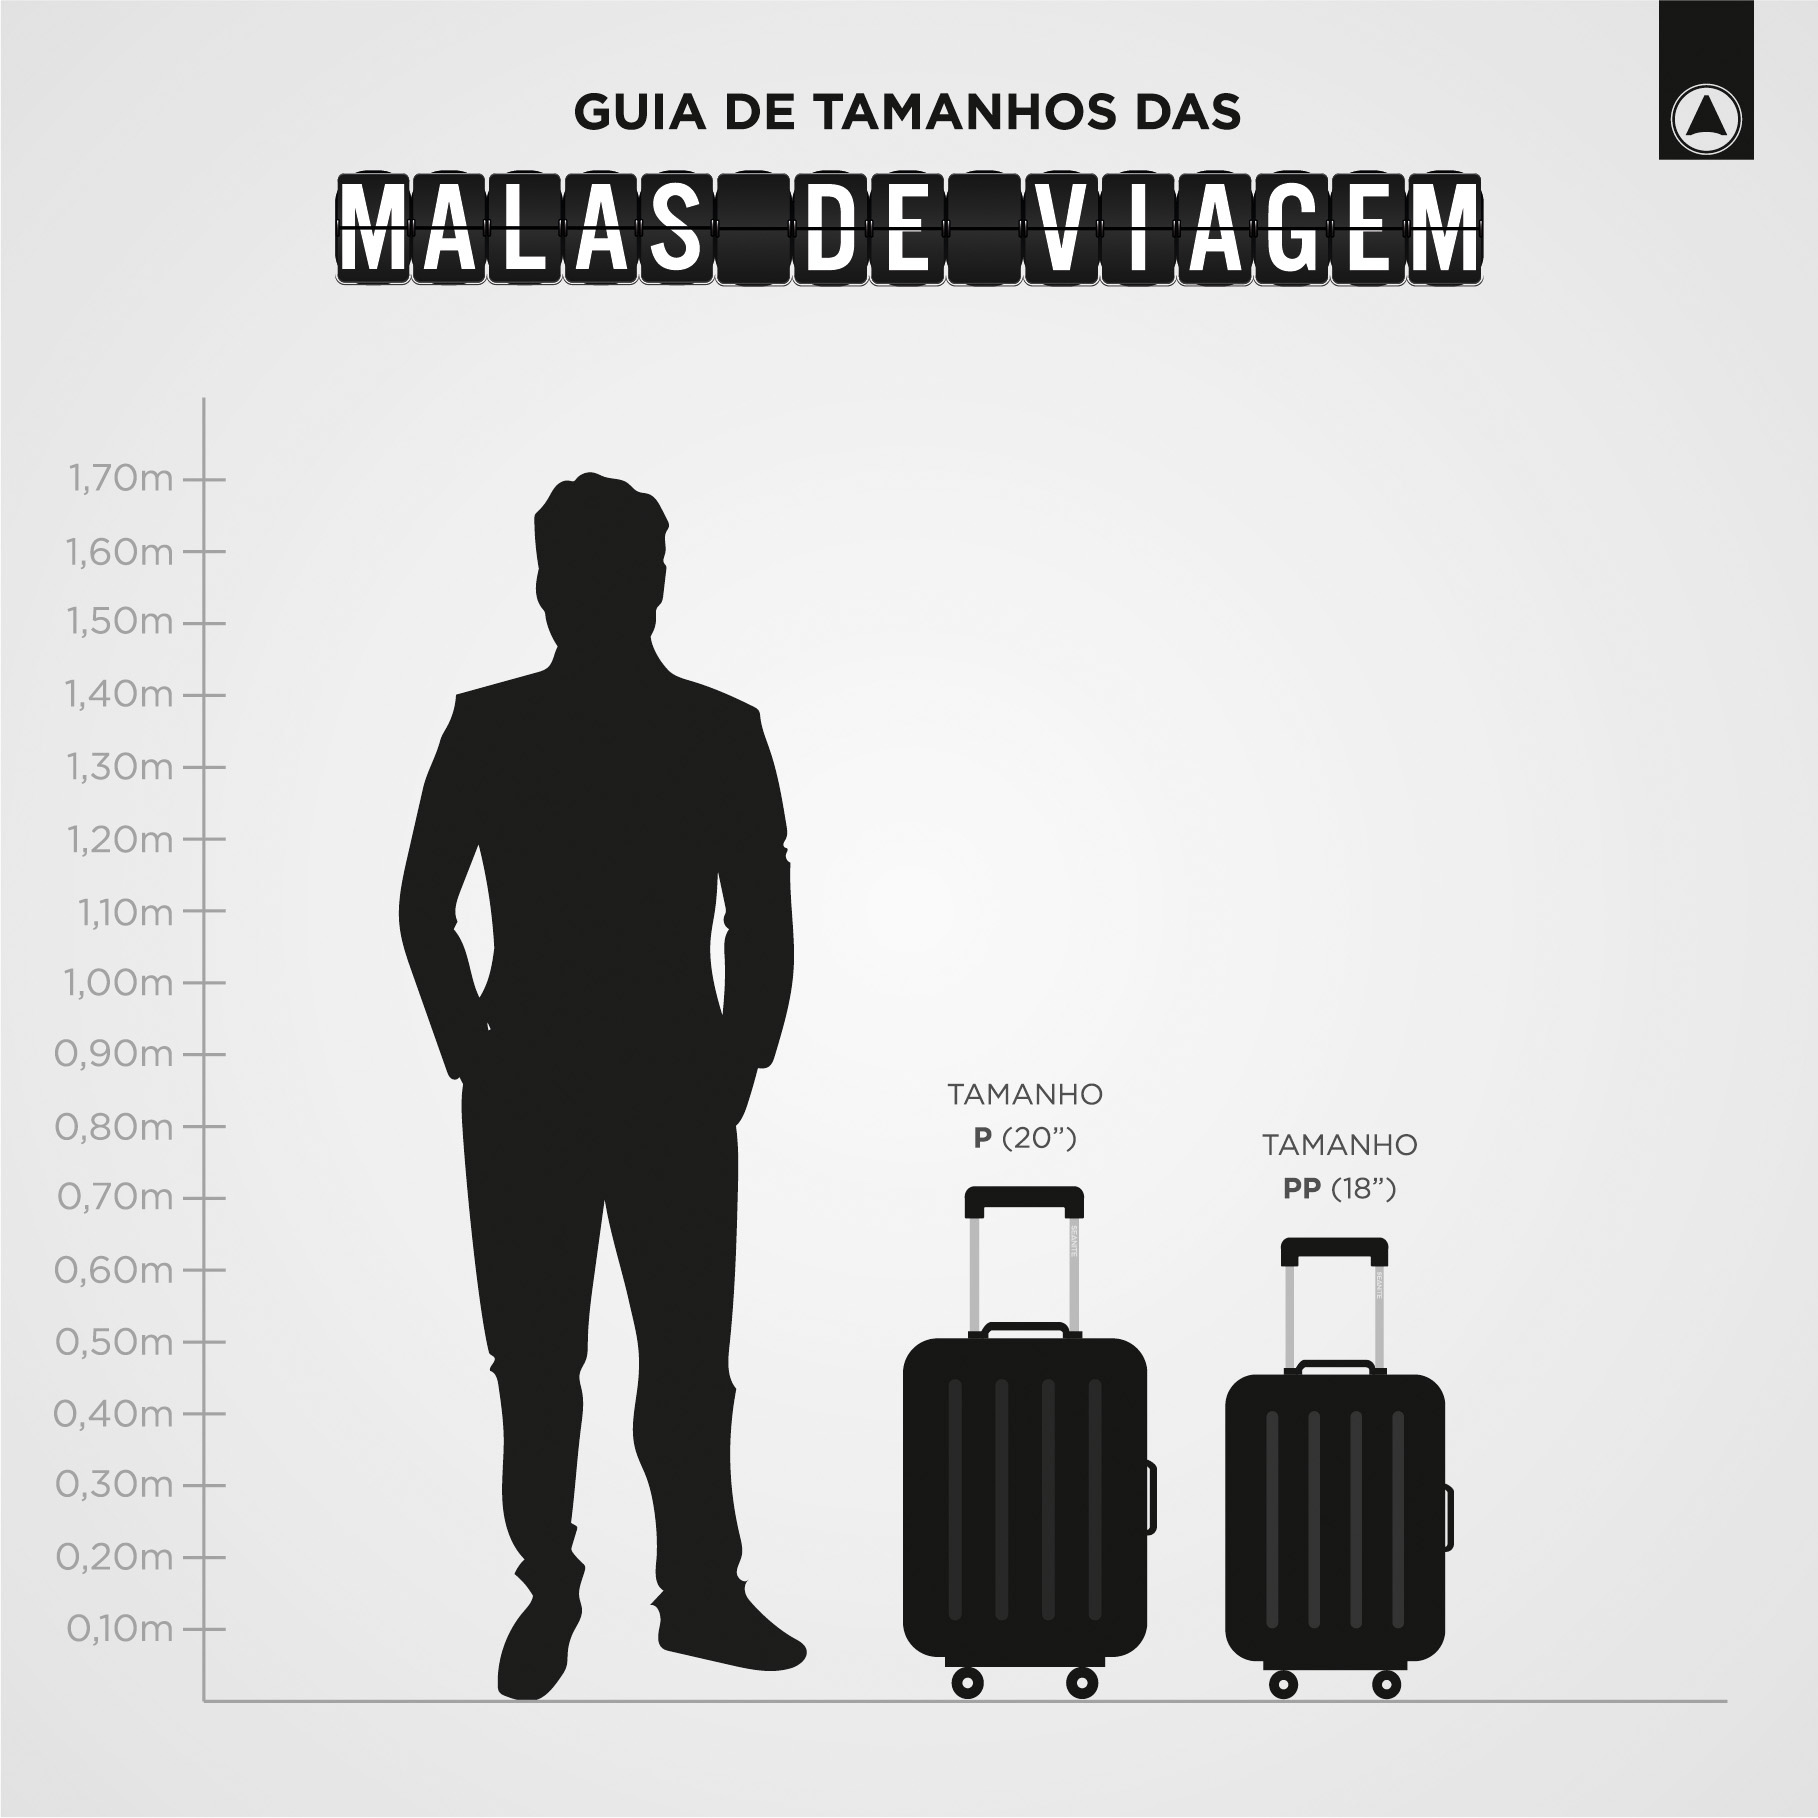 KIT DE MALAS DE BORDO P, PP E FRASQUEIRA PRATA - SEANITE